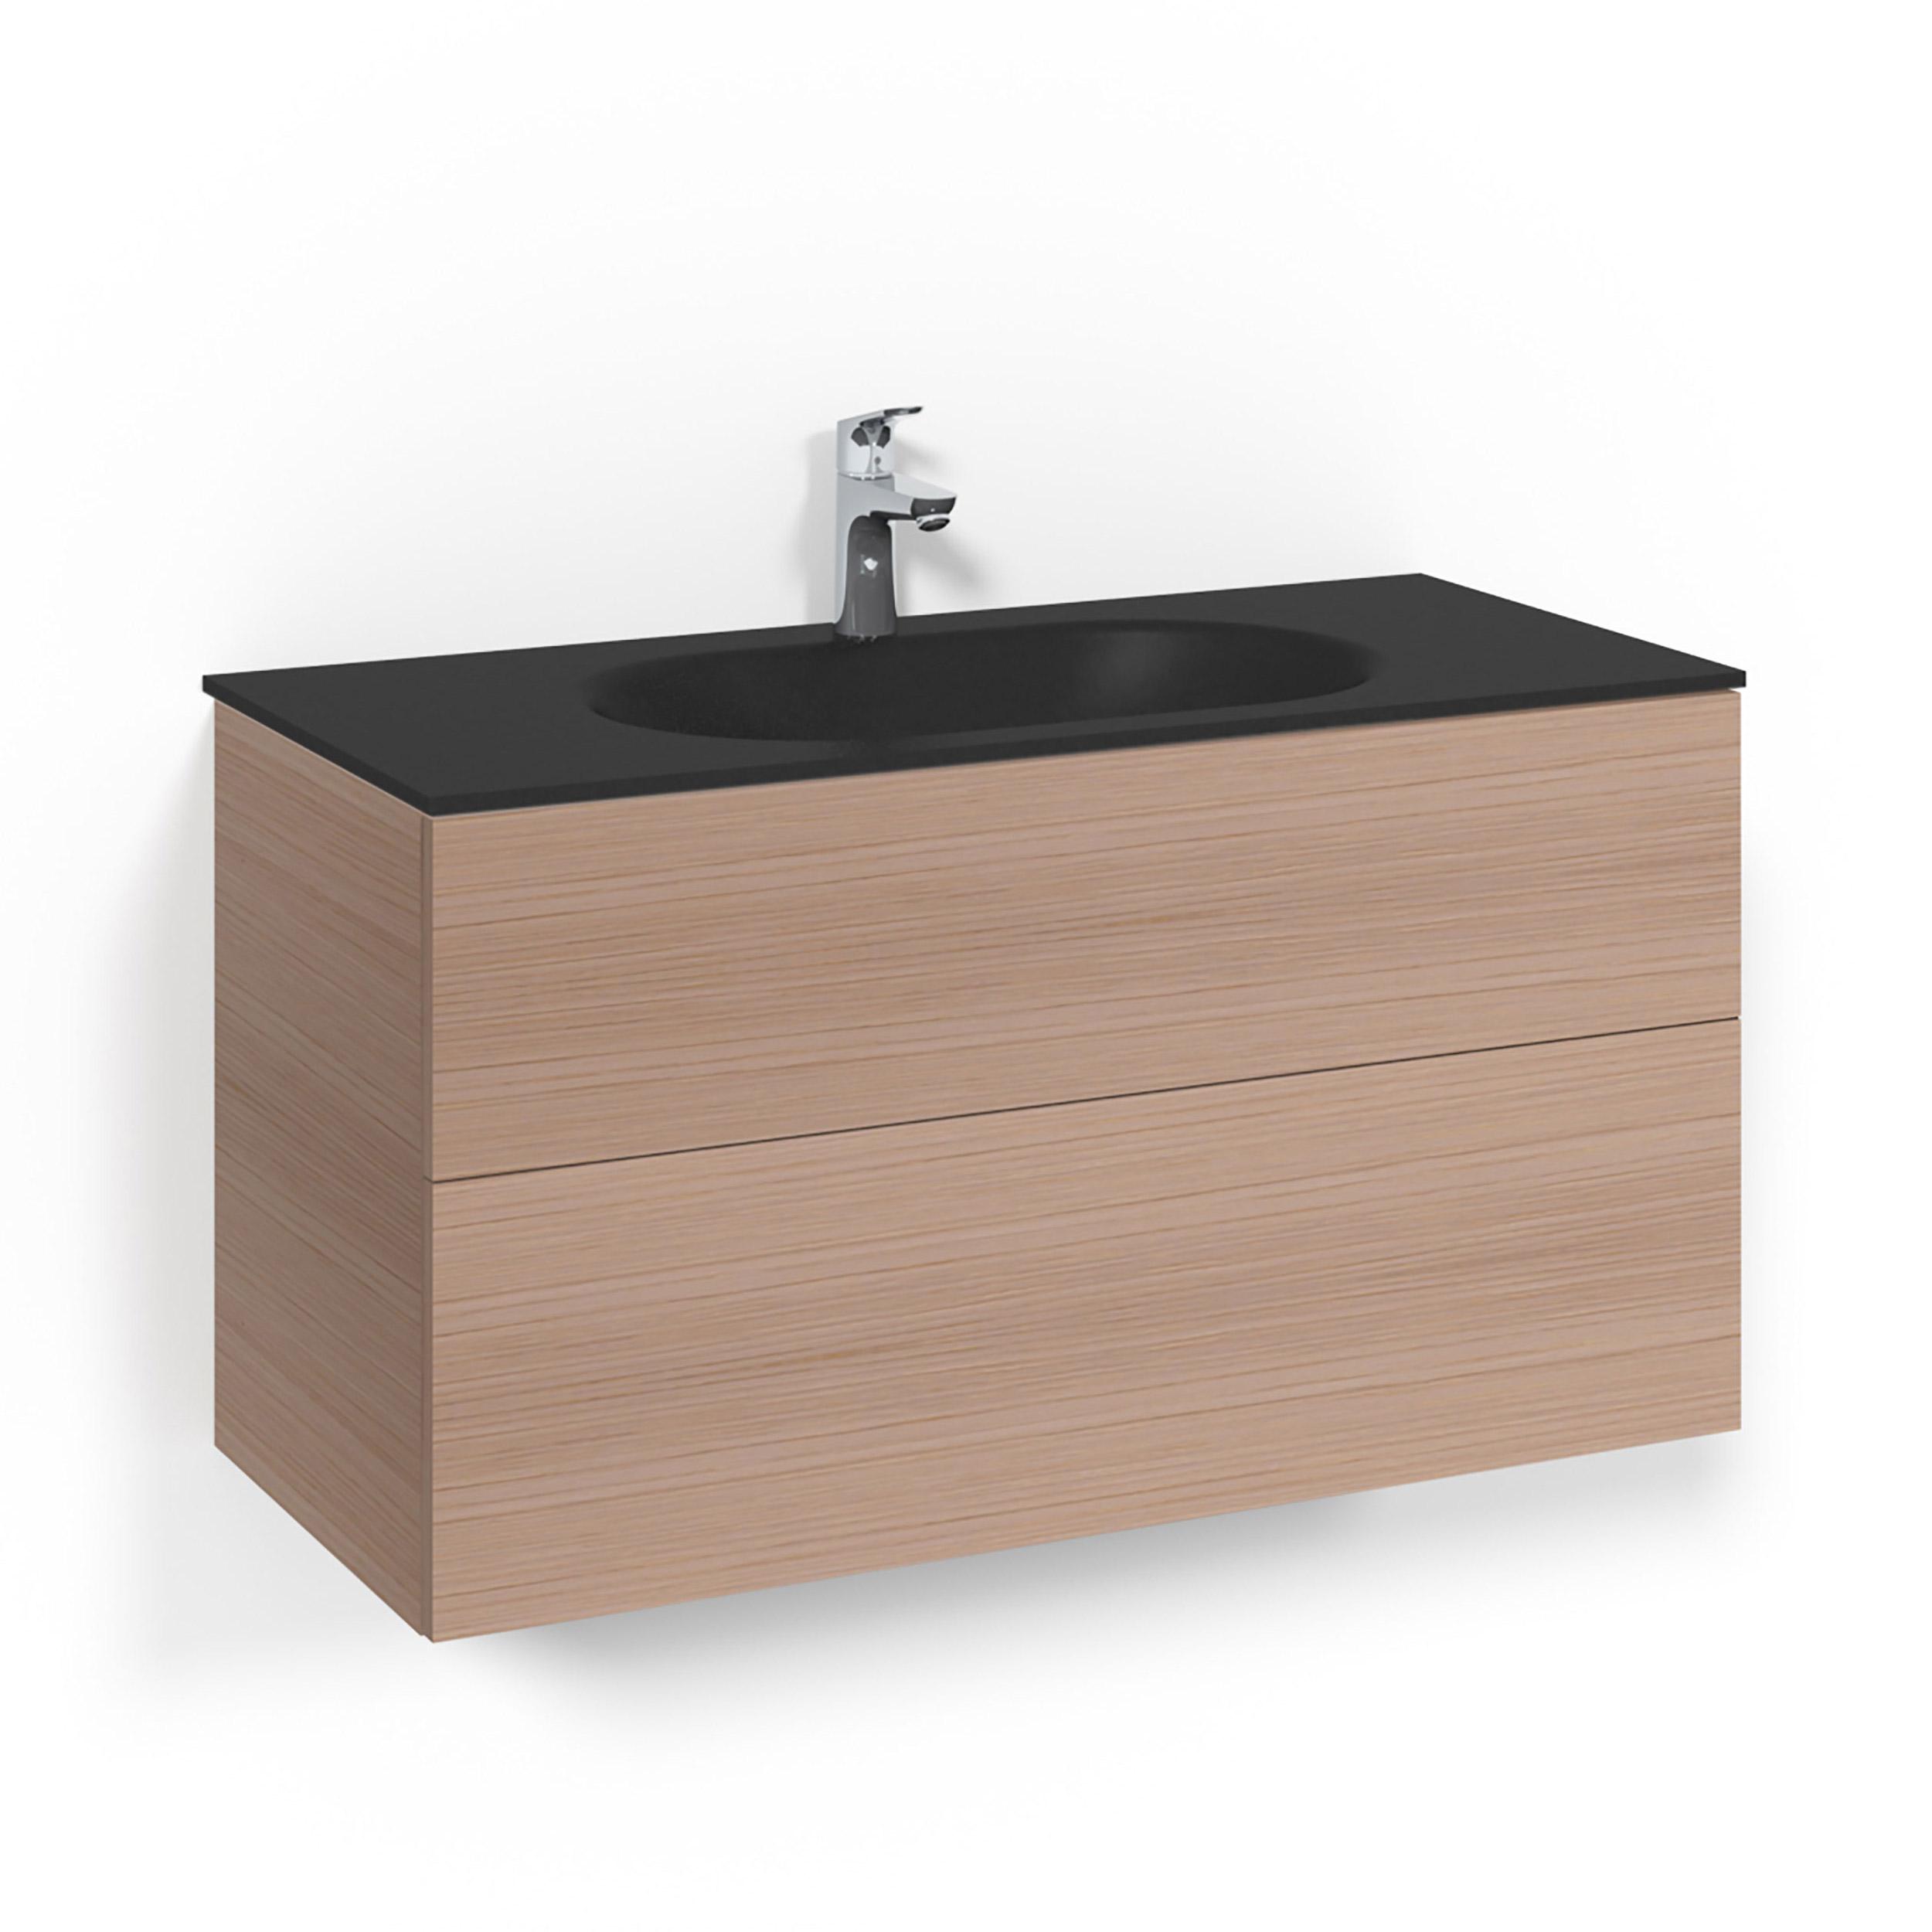 Tvättställsskåp Macro Design Crown Push Open Med Glastvättställ